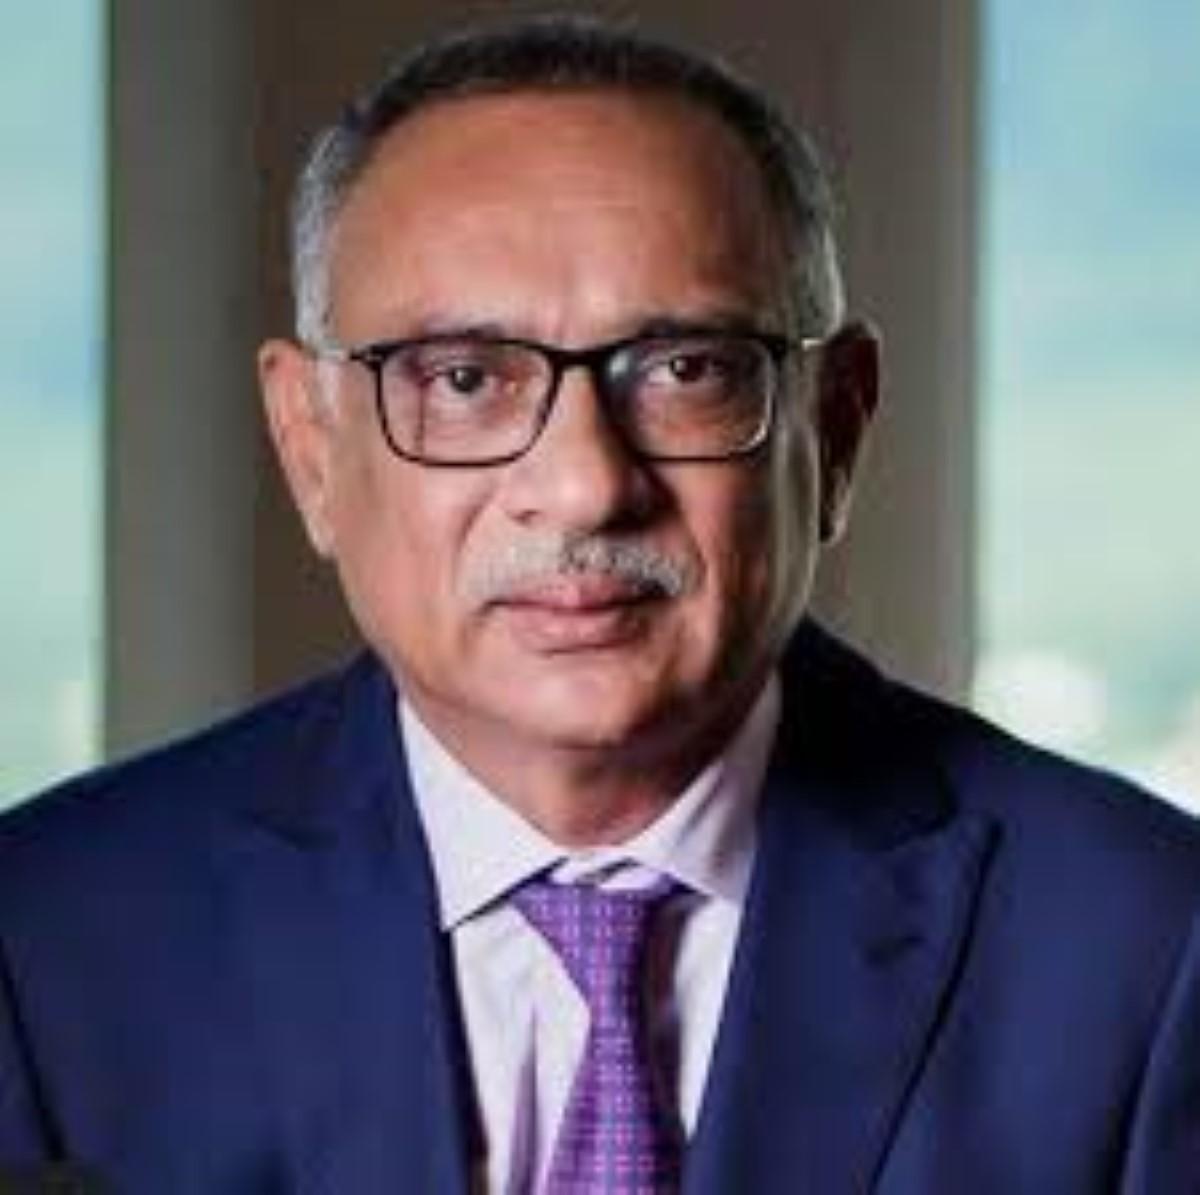 Air Mauritius : Sattar Hajee Abdoula et Arvin Gokhool restent administrateurs